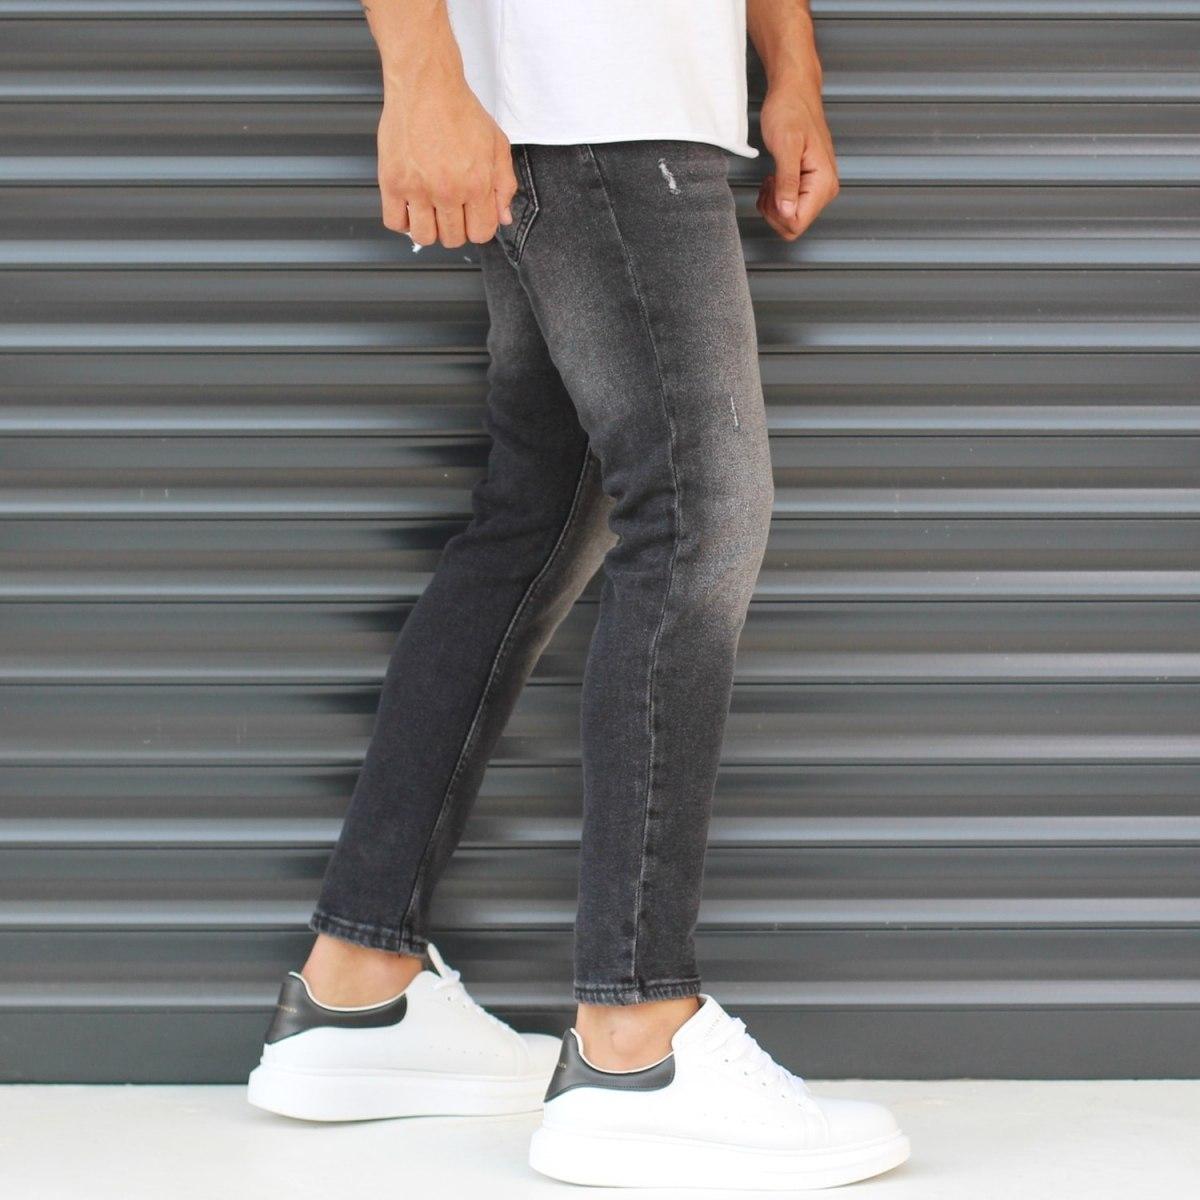 Men's Basic Stonewashed Jeans In Black Mv Premium Brand - 3